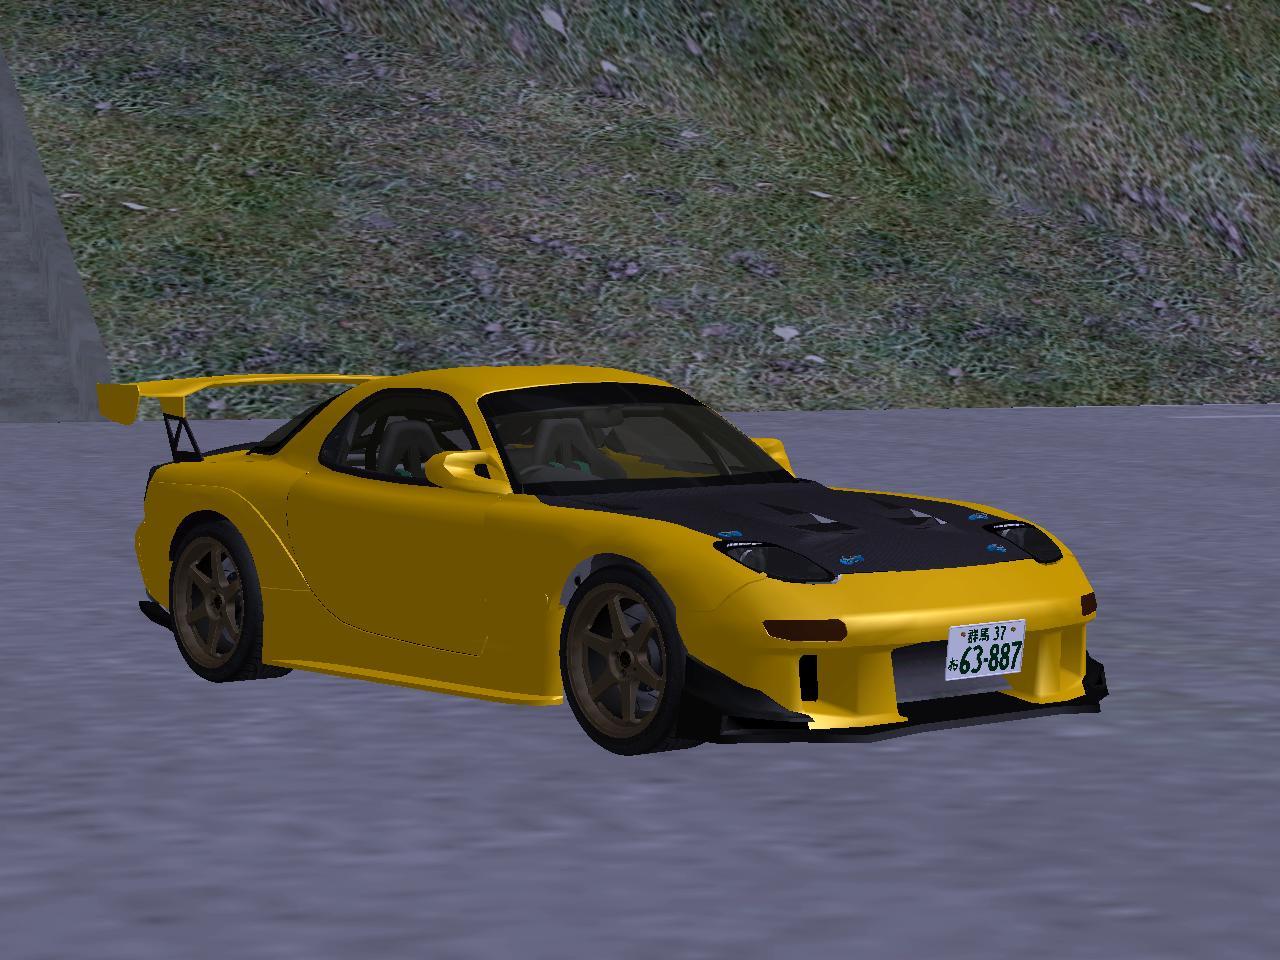 Yokota Workshop: Initial D Fifth Stage Keisuke Takahashi Mazda RX-7 FD3s GTA SA